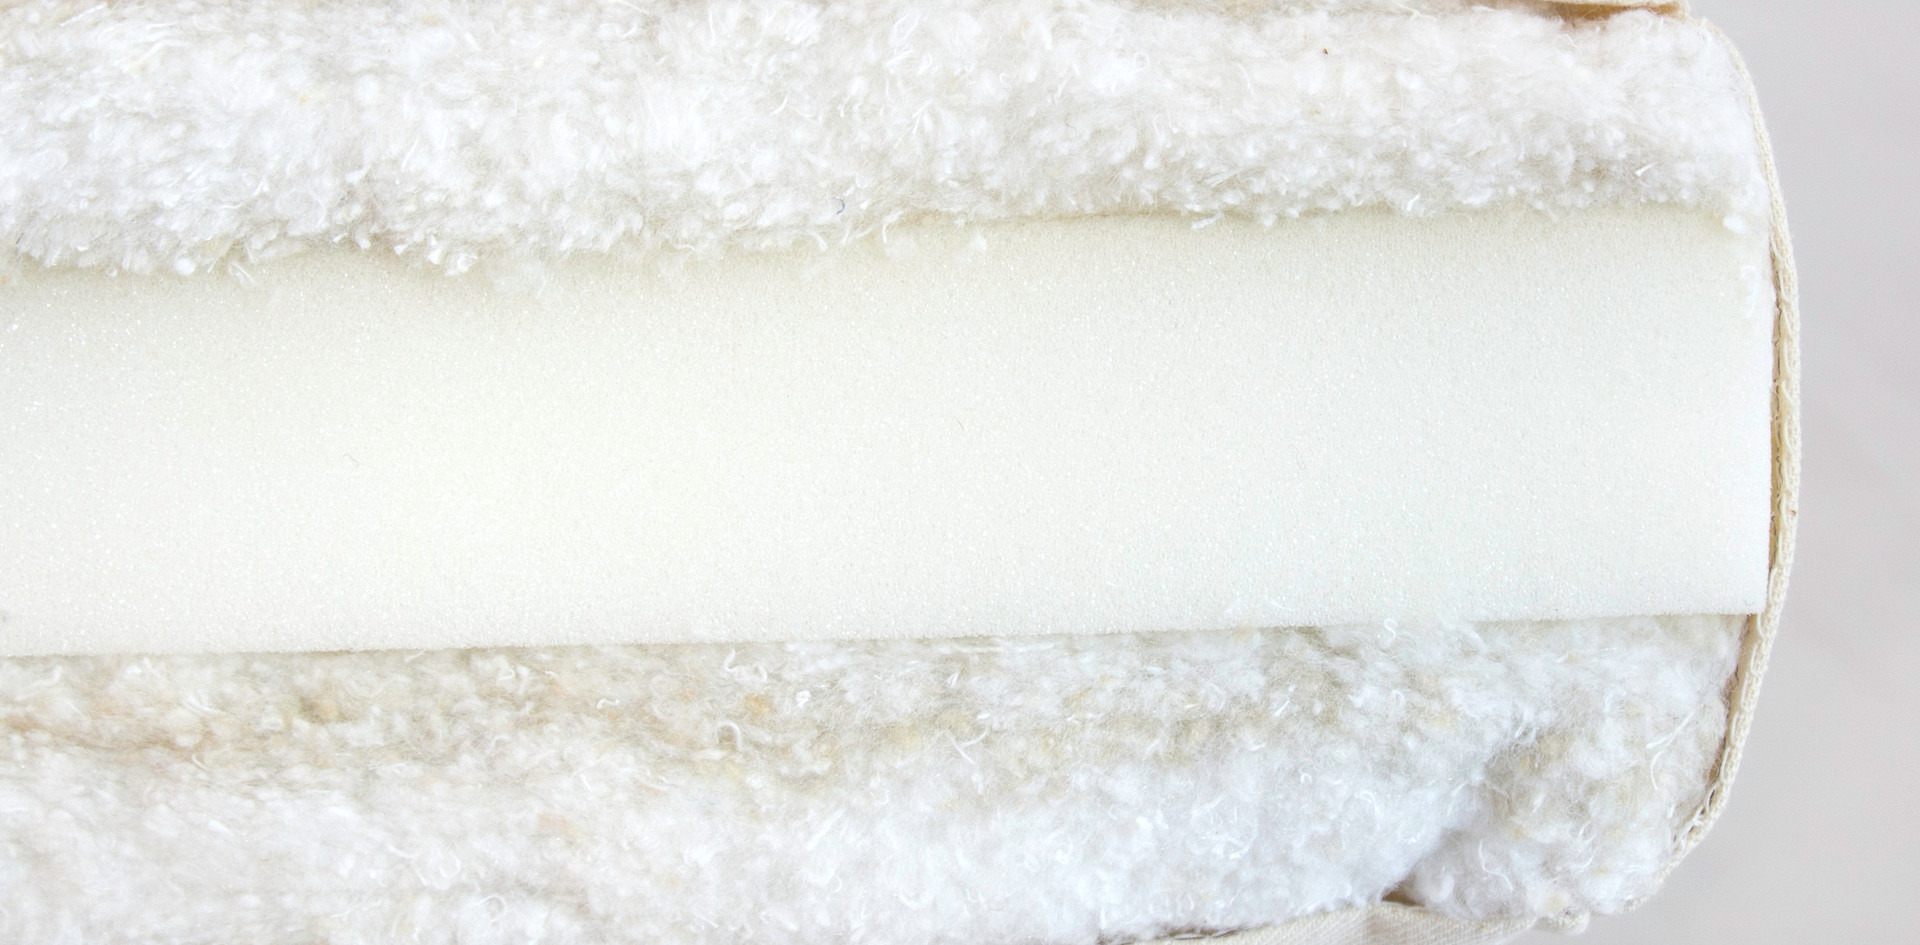 basic futon στρώμα 180Χ200 χειροποίητο οικολογικό μέτριας σκληρότητας